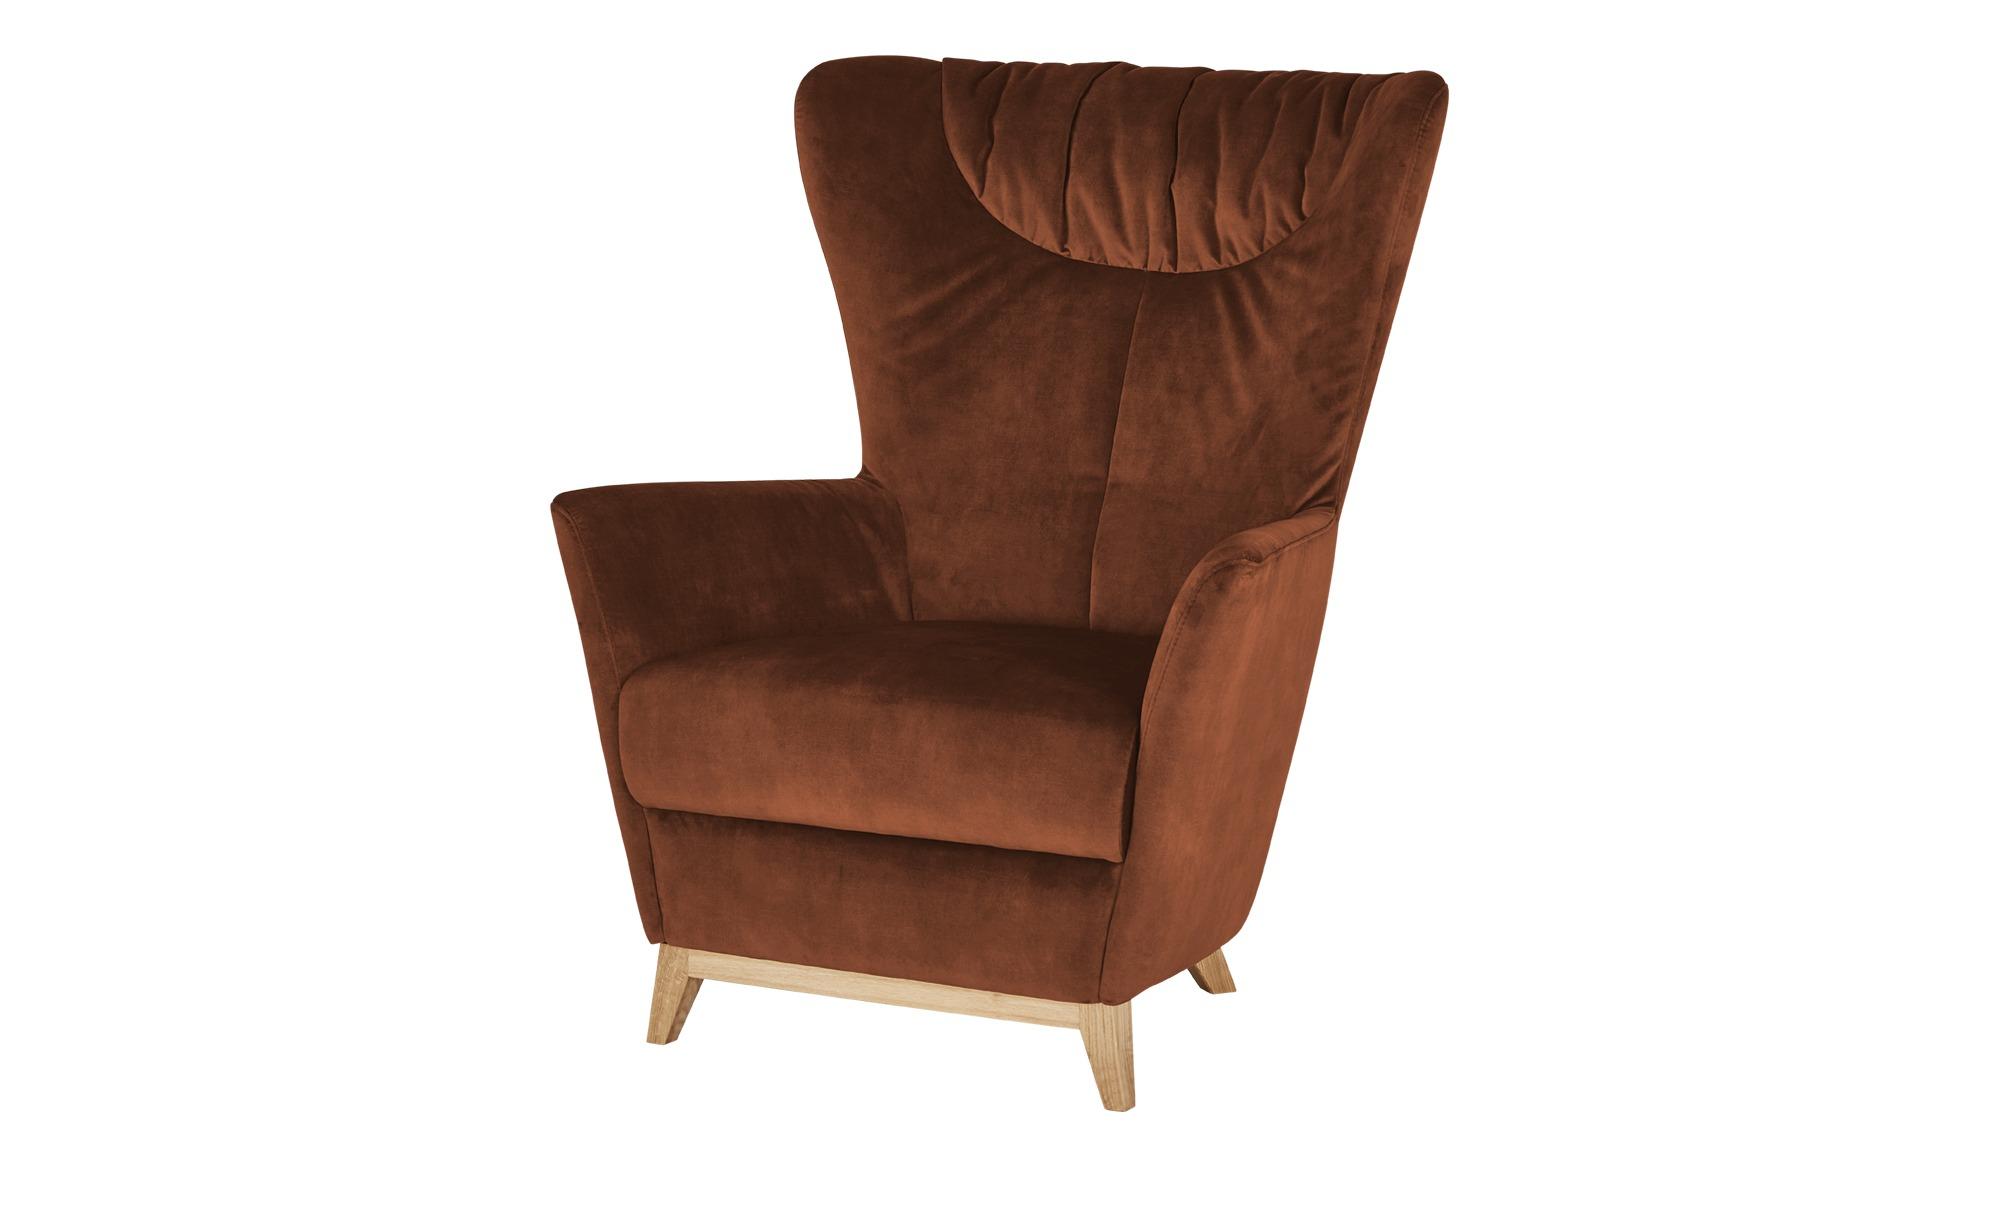 Ravensberger Werkstätten Sessel  Bernadino ¦ rot ¦ Maße (cm): B: 88 H: 112 T: 95 Polstermöbel > Sessel > Ohrensessel - Höffner